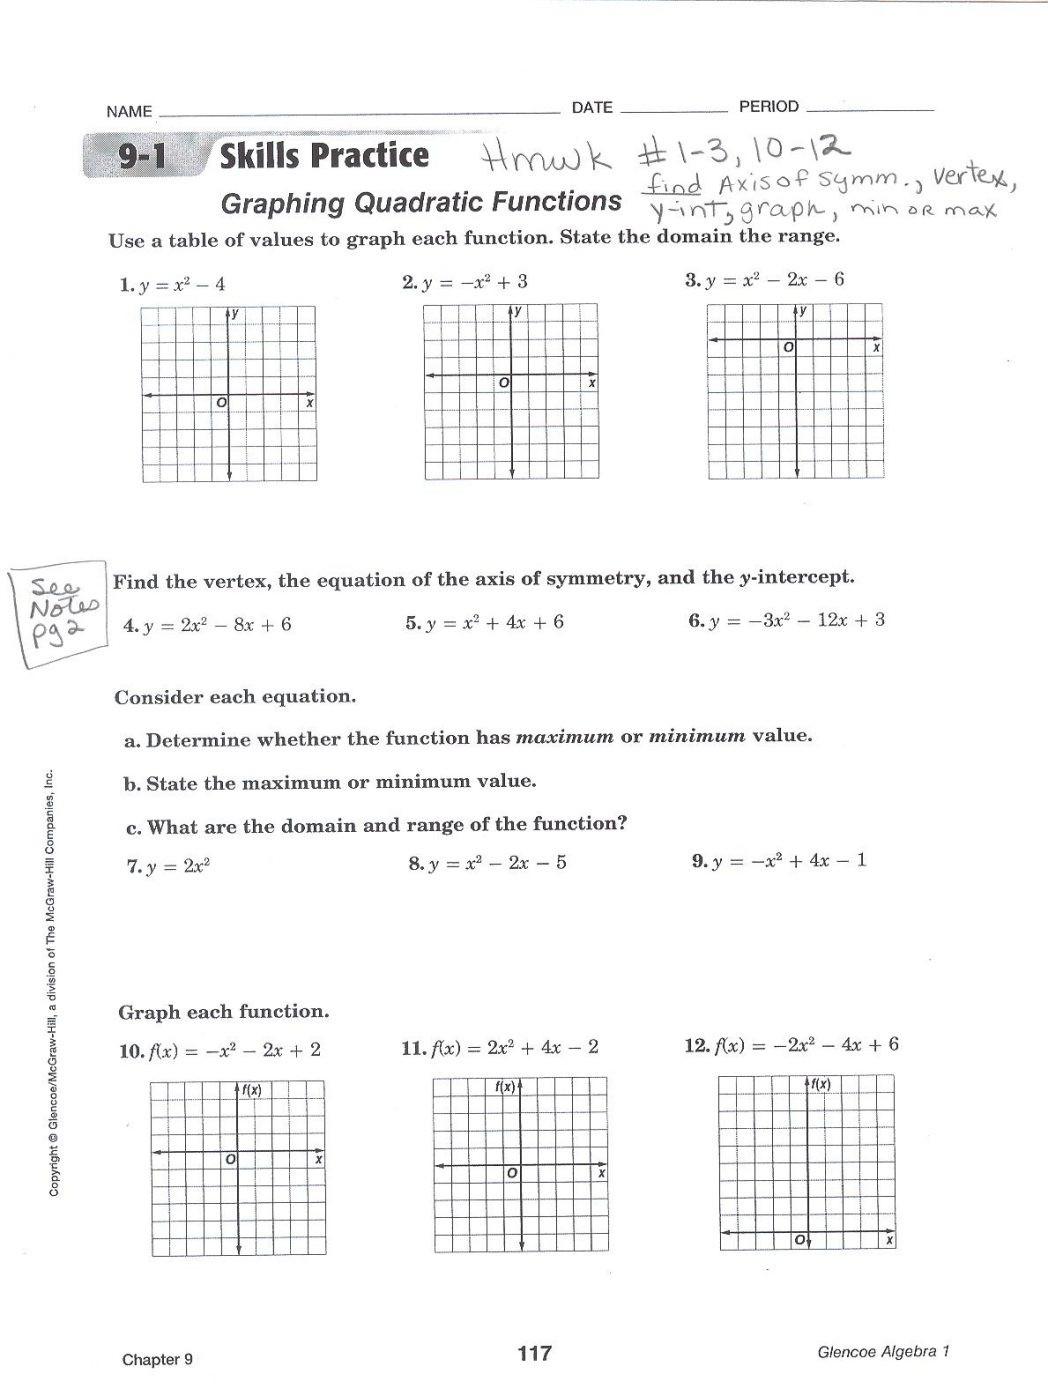 Quadratic Functions Worksheet Answers Graph Quadratic Functions Worksheet Answers